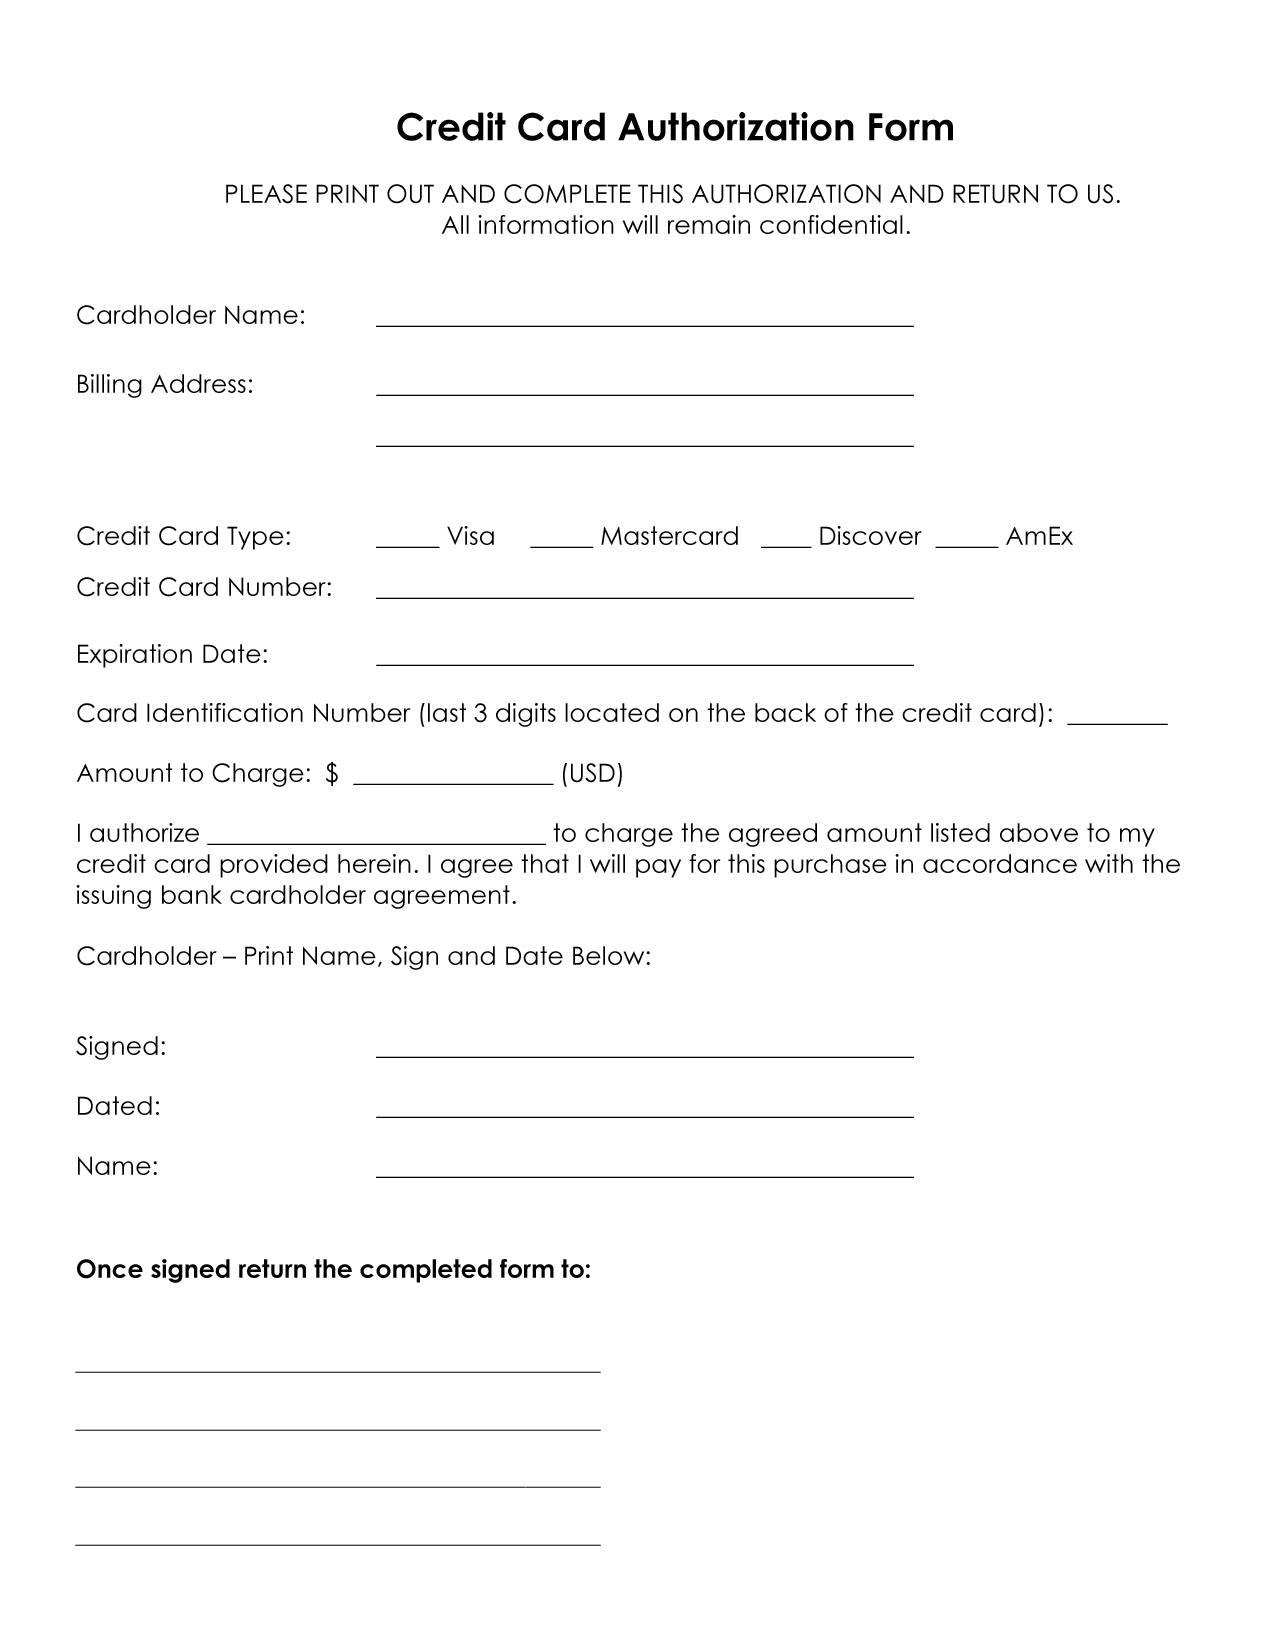 credit card authorization form visa professional resume cover credit card authorization form visa credit card authorization form cin online blank credit card template credit